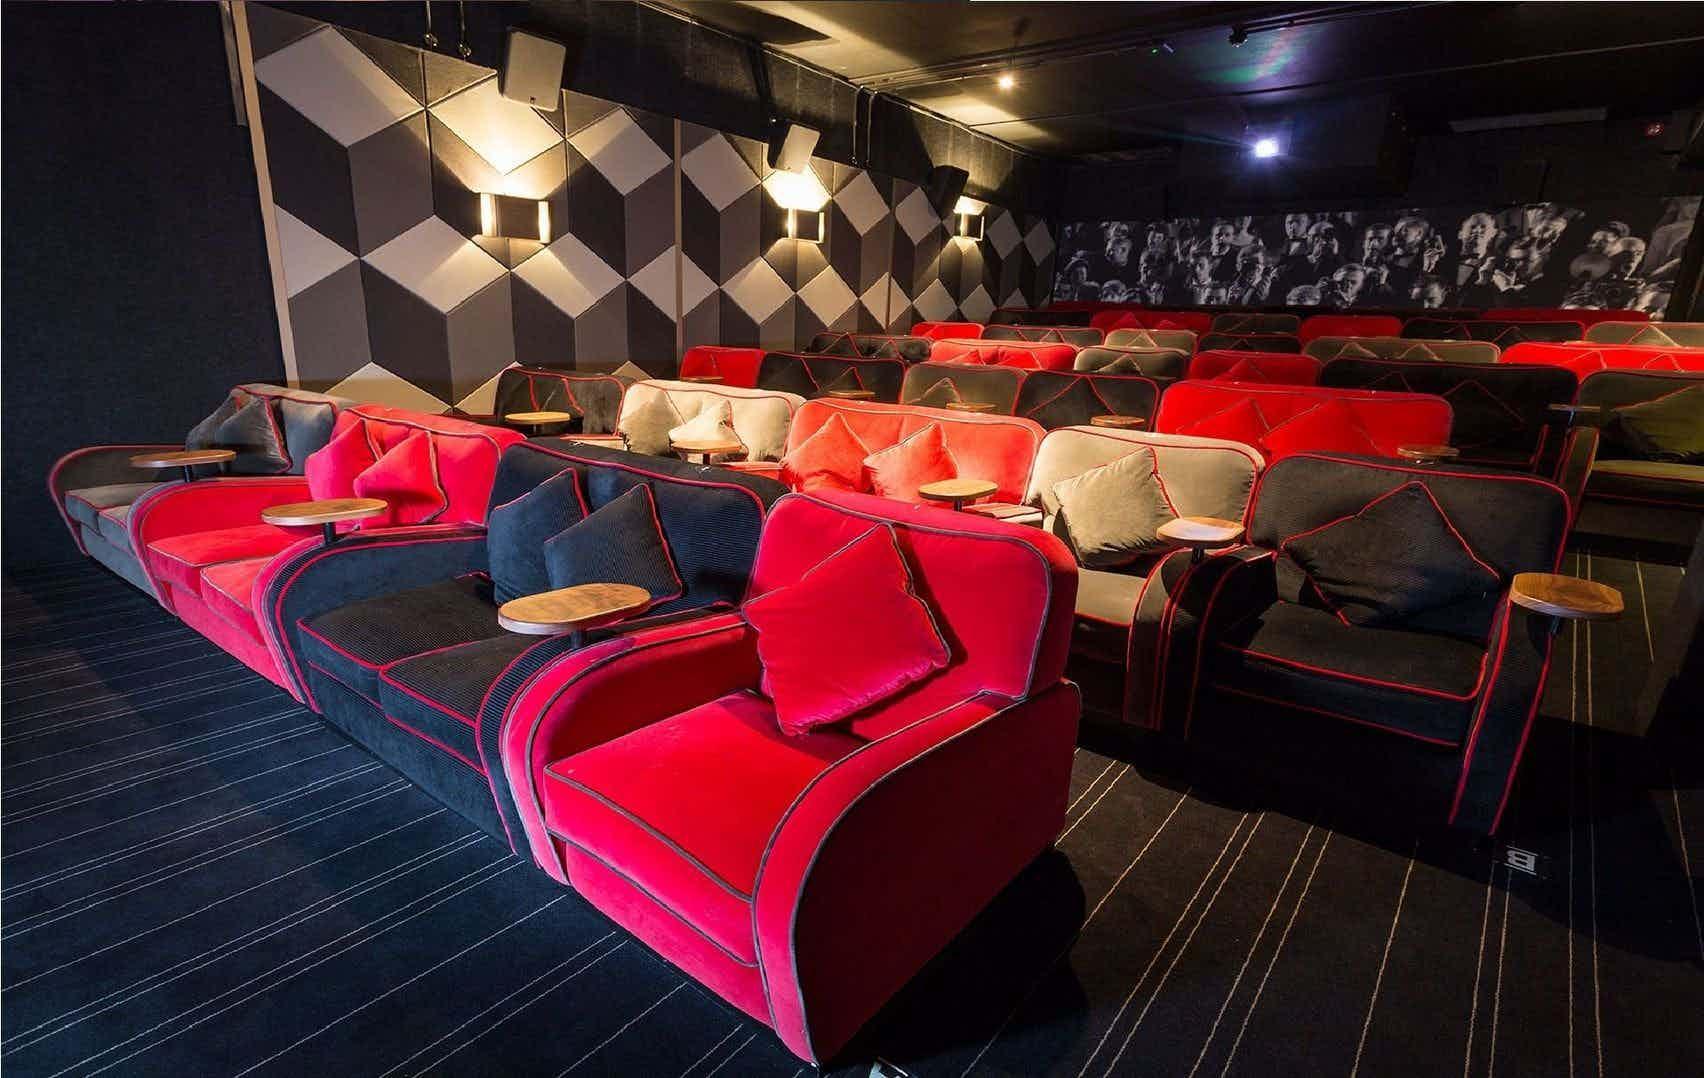 Book Screen 1 at Everyman Cinema Baker Street  A London